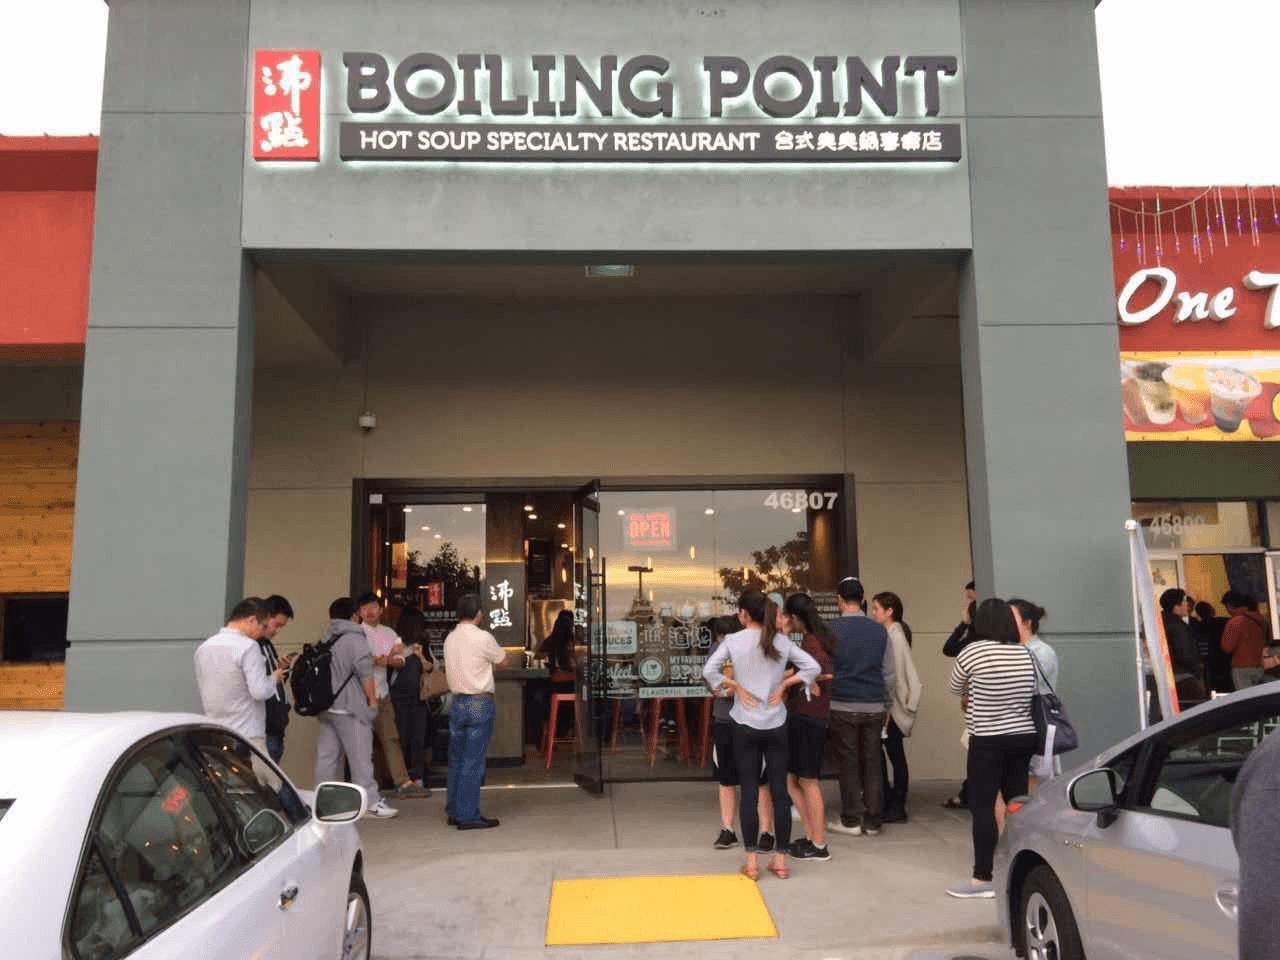 Boiling Point 沸點-灣區 Fremont 46807 Warm Spring Blvd., Fremont, CA 94539